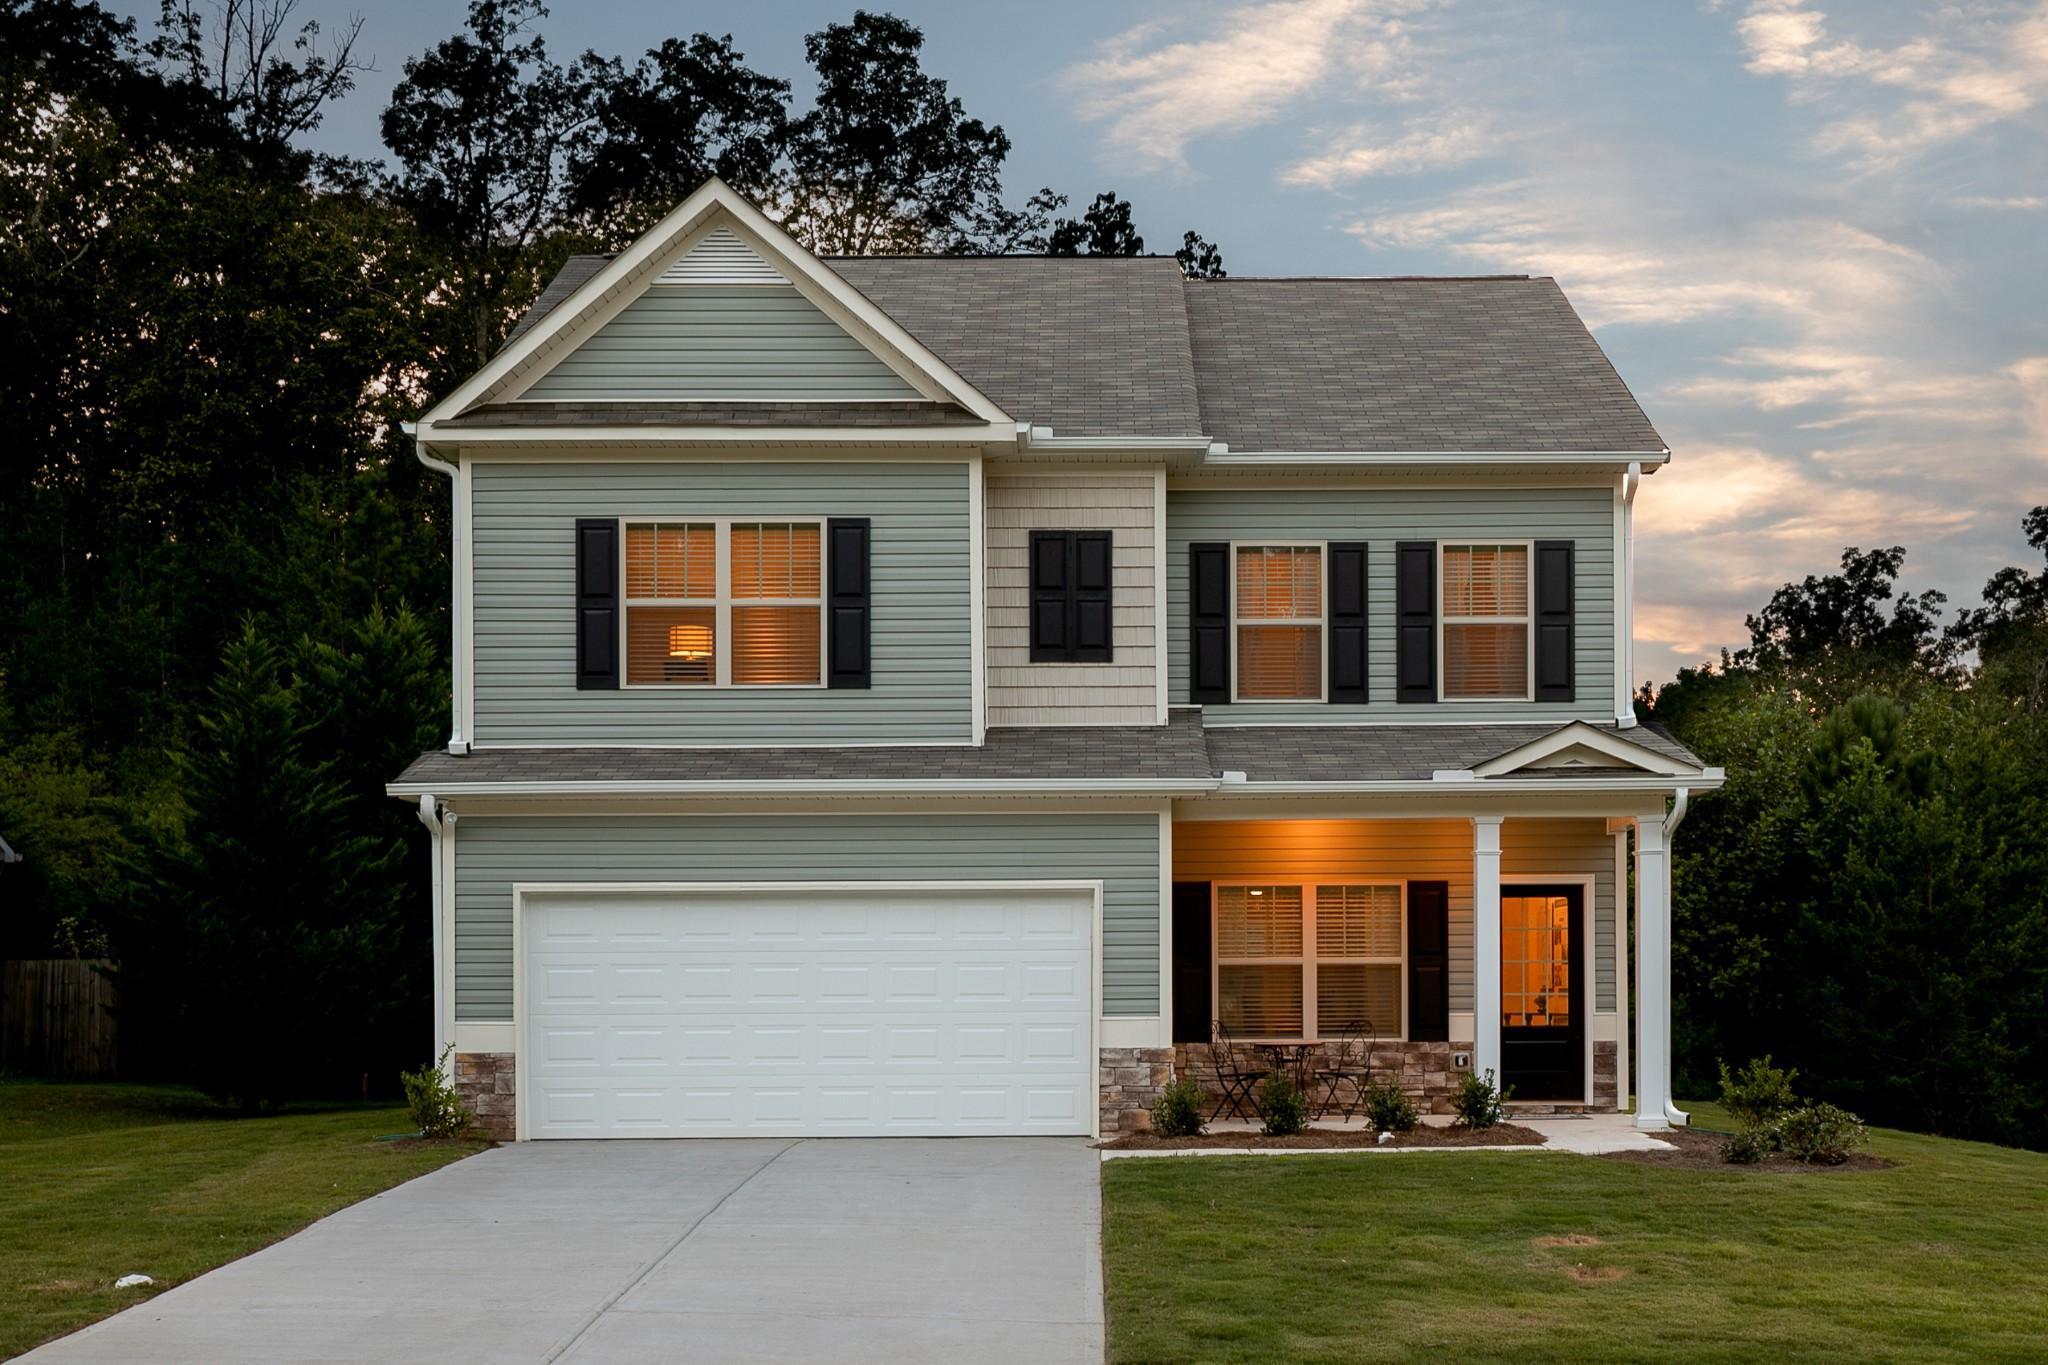 558 Sunflower Drive, Smyrna, TN 37167 - Smyrna, TN real estate listing